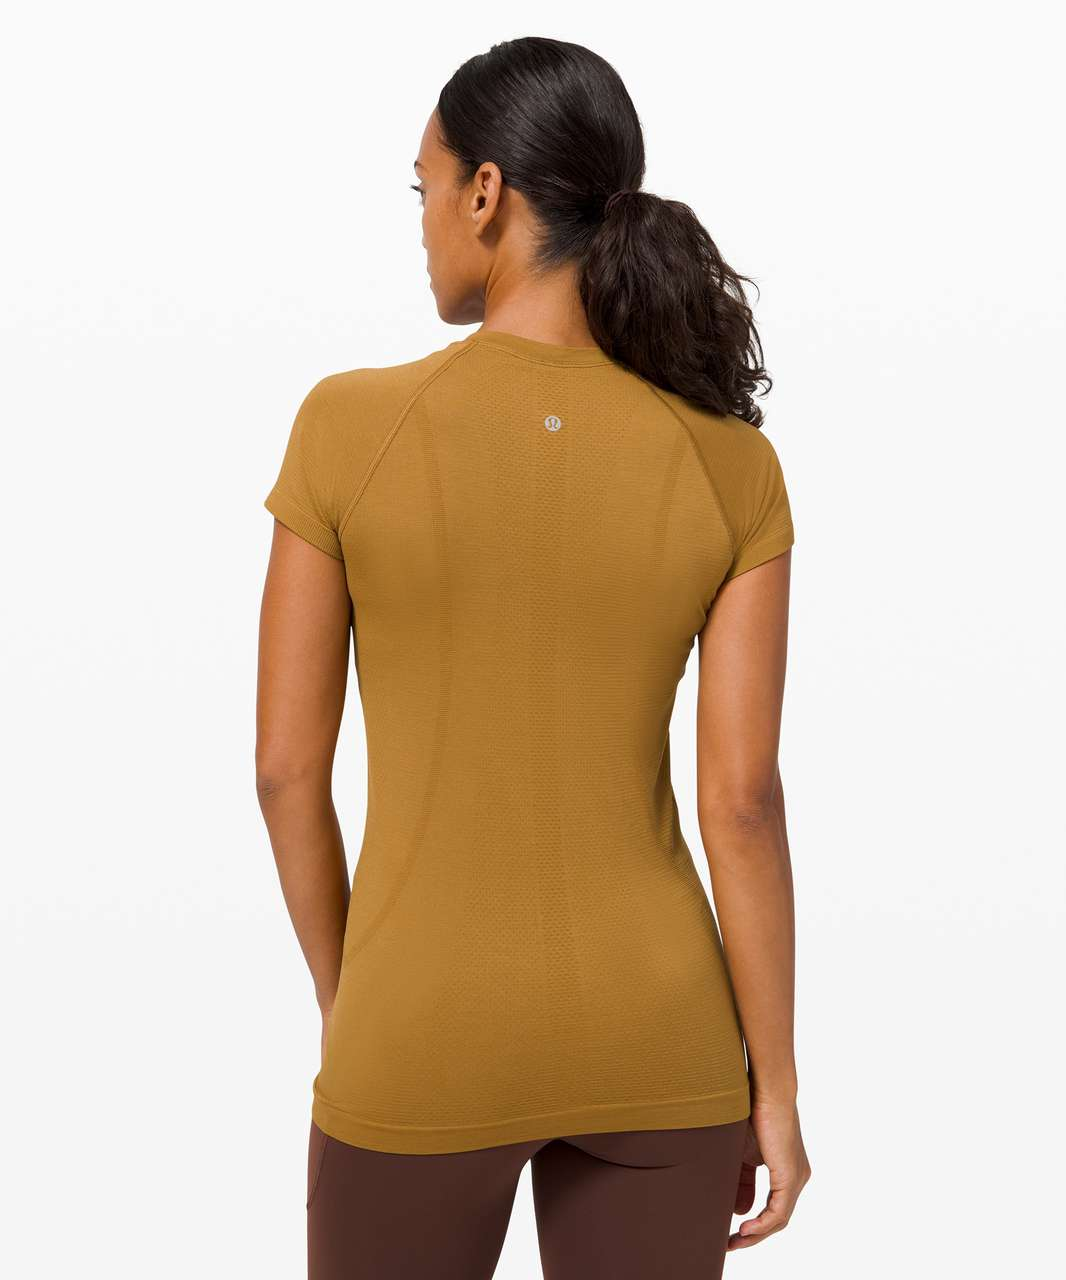 Lululemon Swiftly Tech Short Sleeve 2.0 - Spiced Bronze / Spiced Bronze